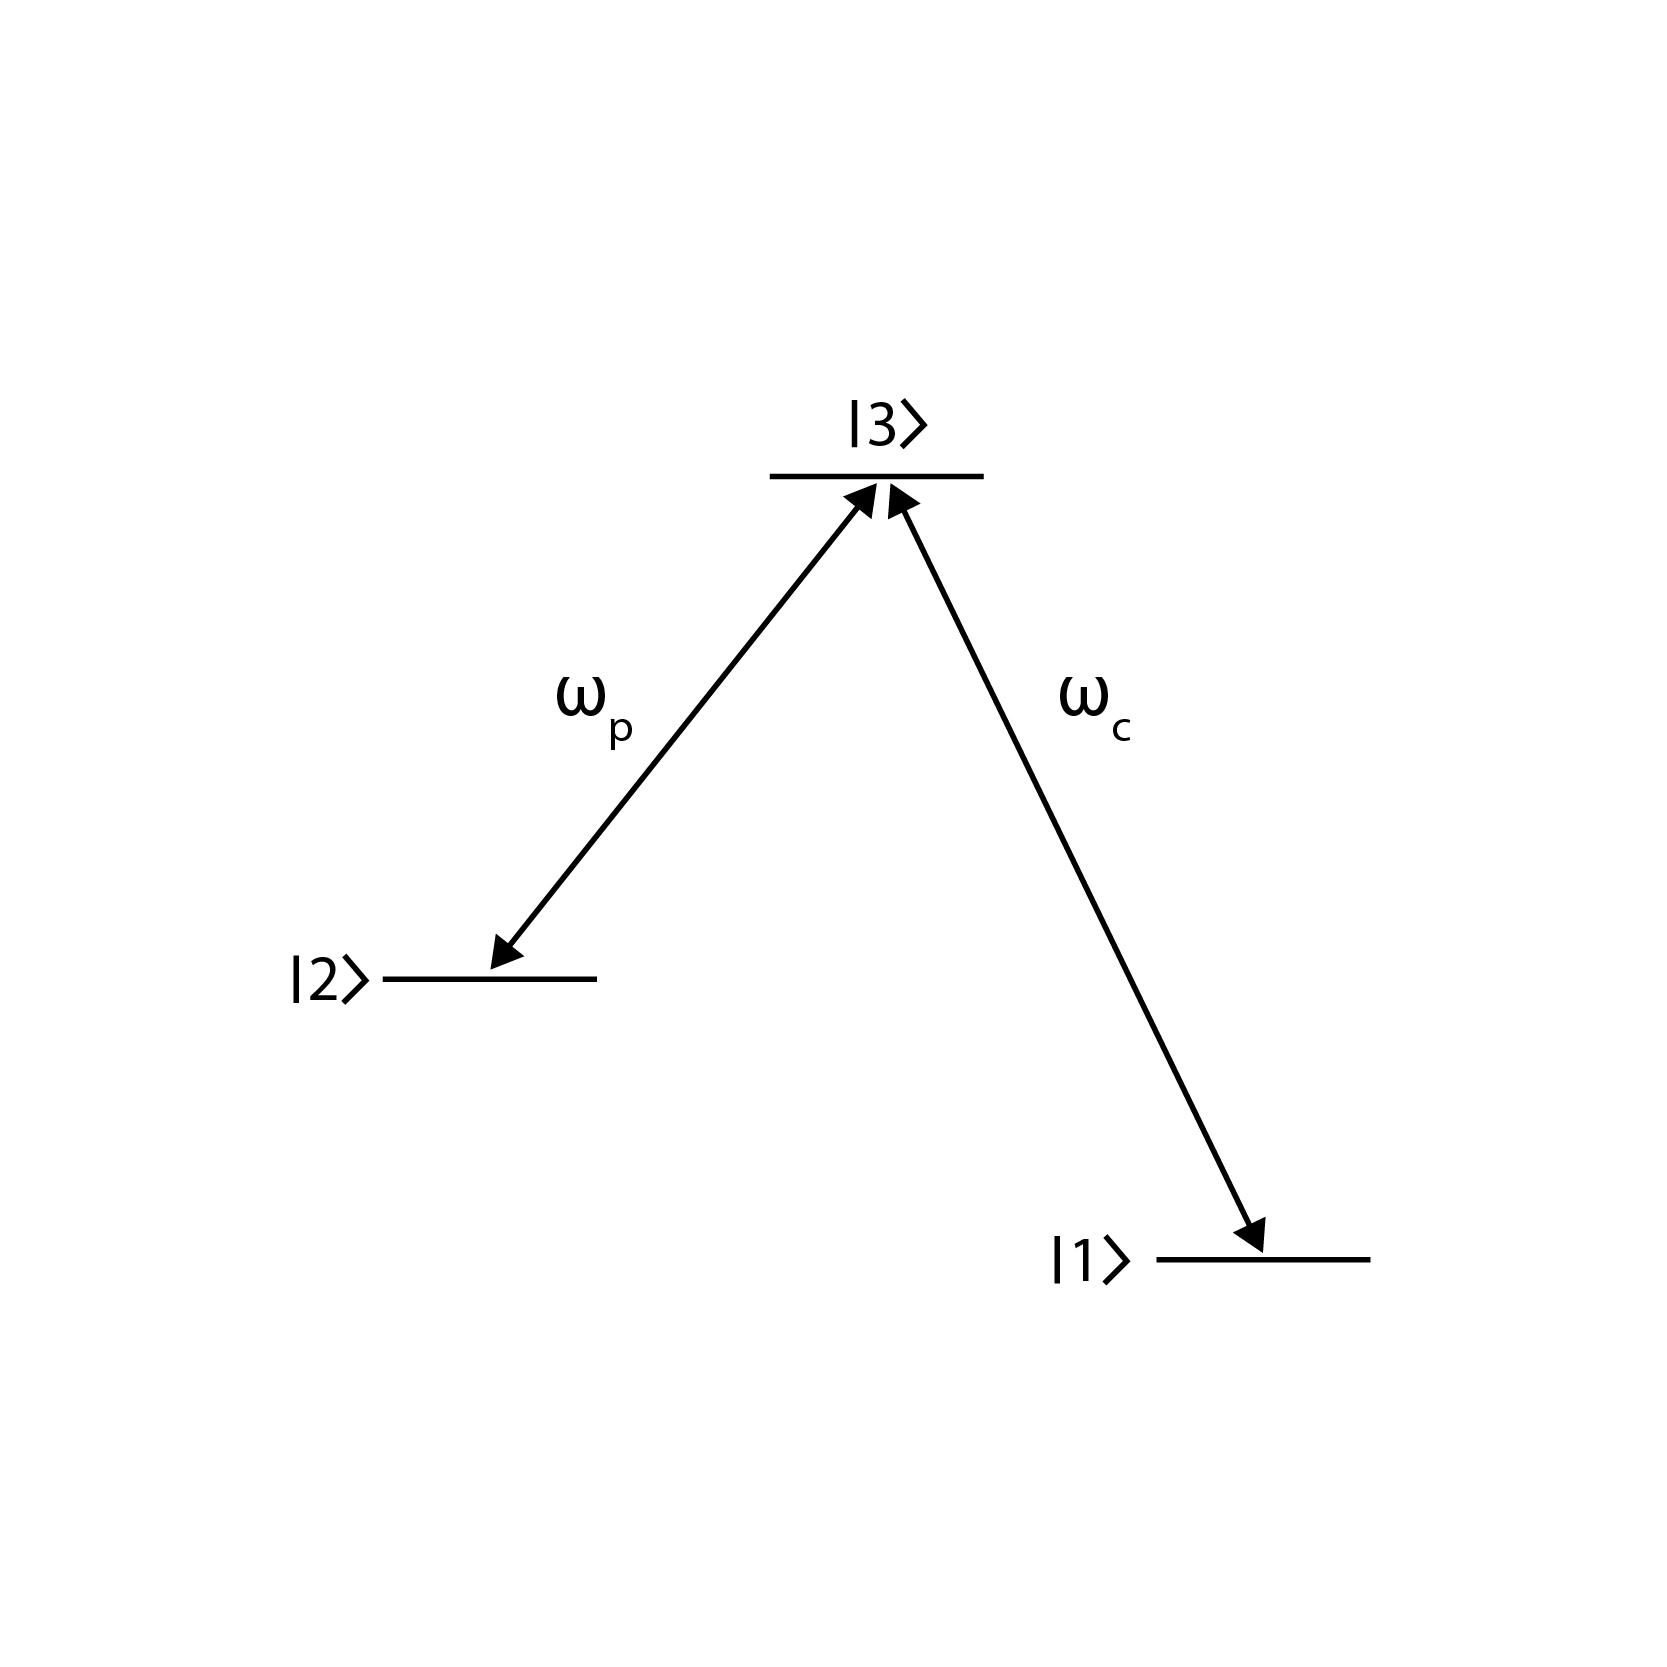 ICFO-DAALI-rationale-Daniel-Cavalcanti-01